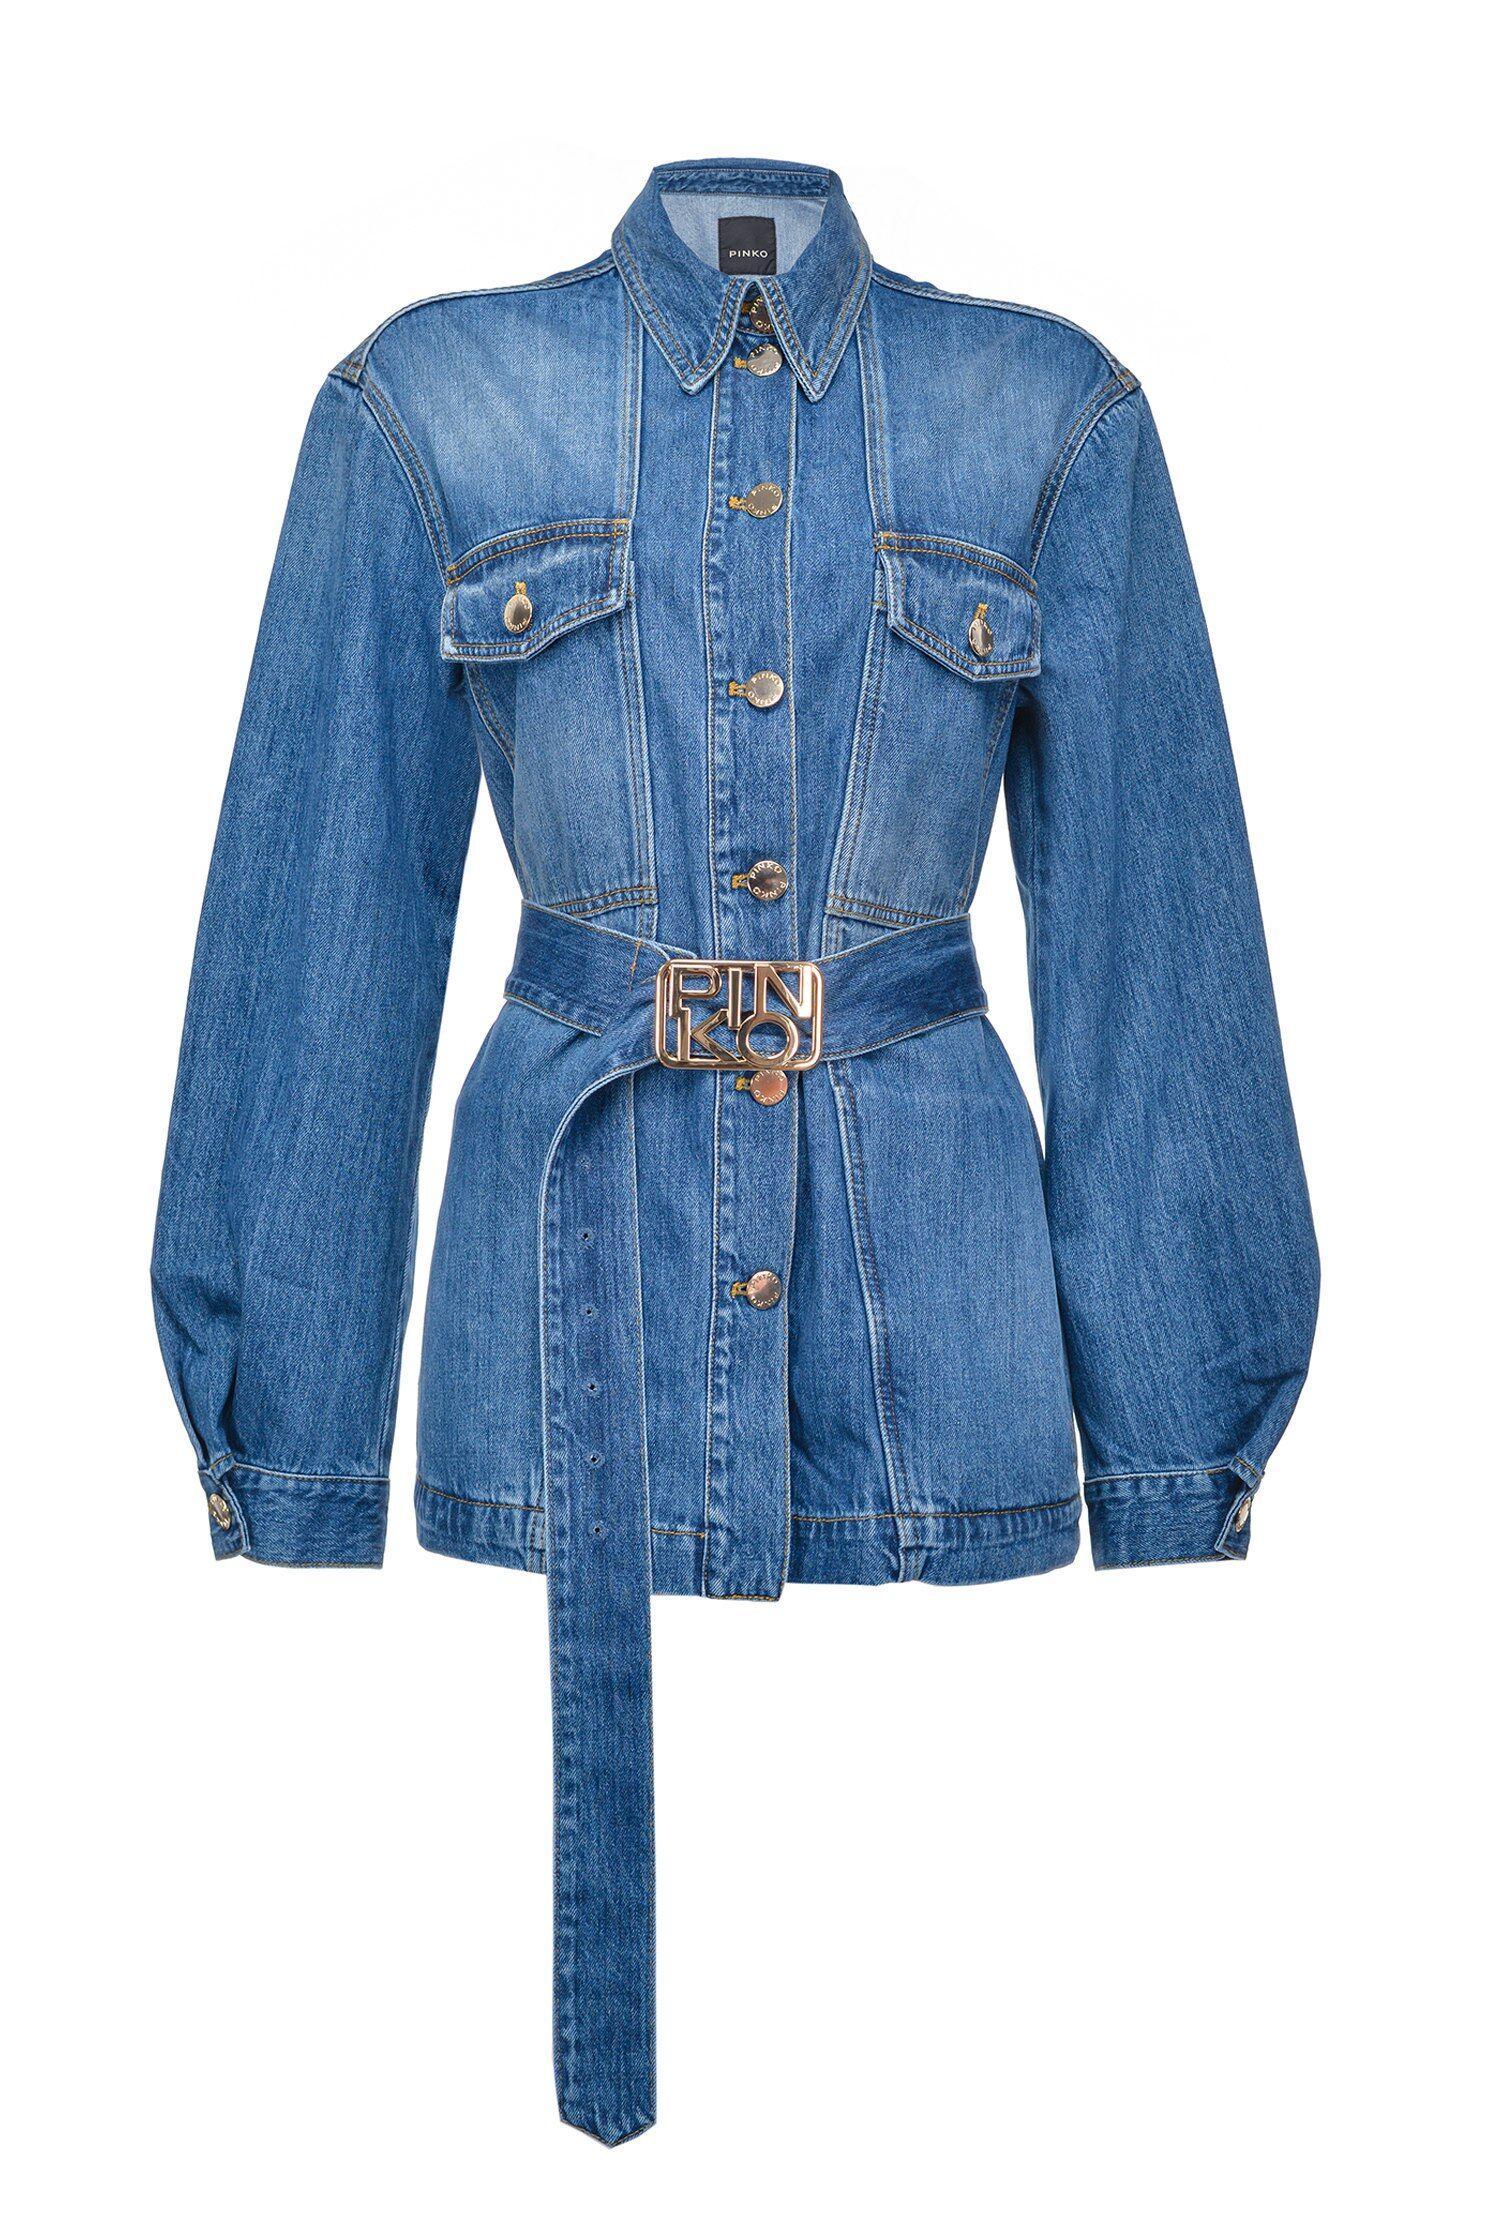 Denim Jacket With Logo Buckle - Pinko